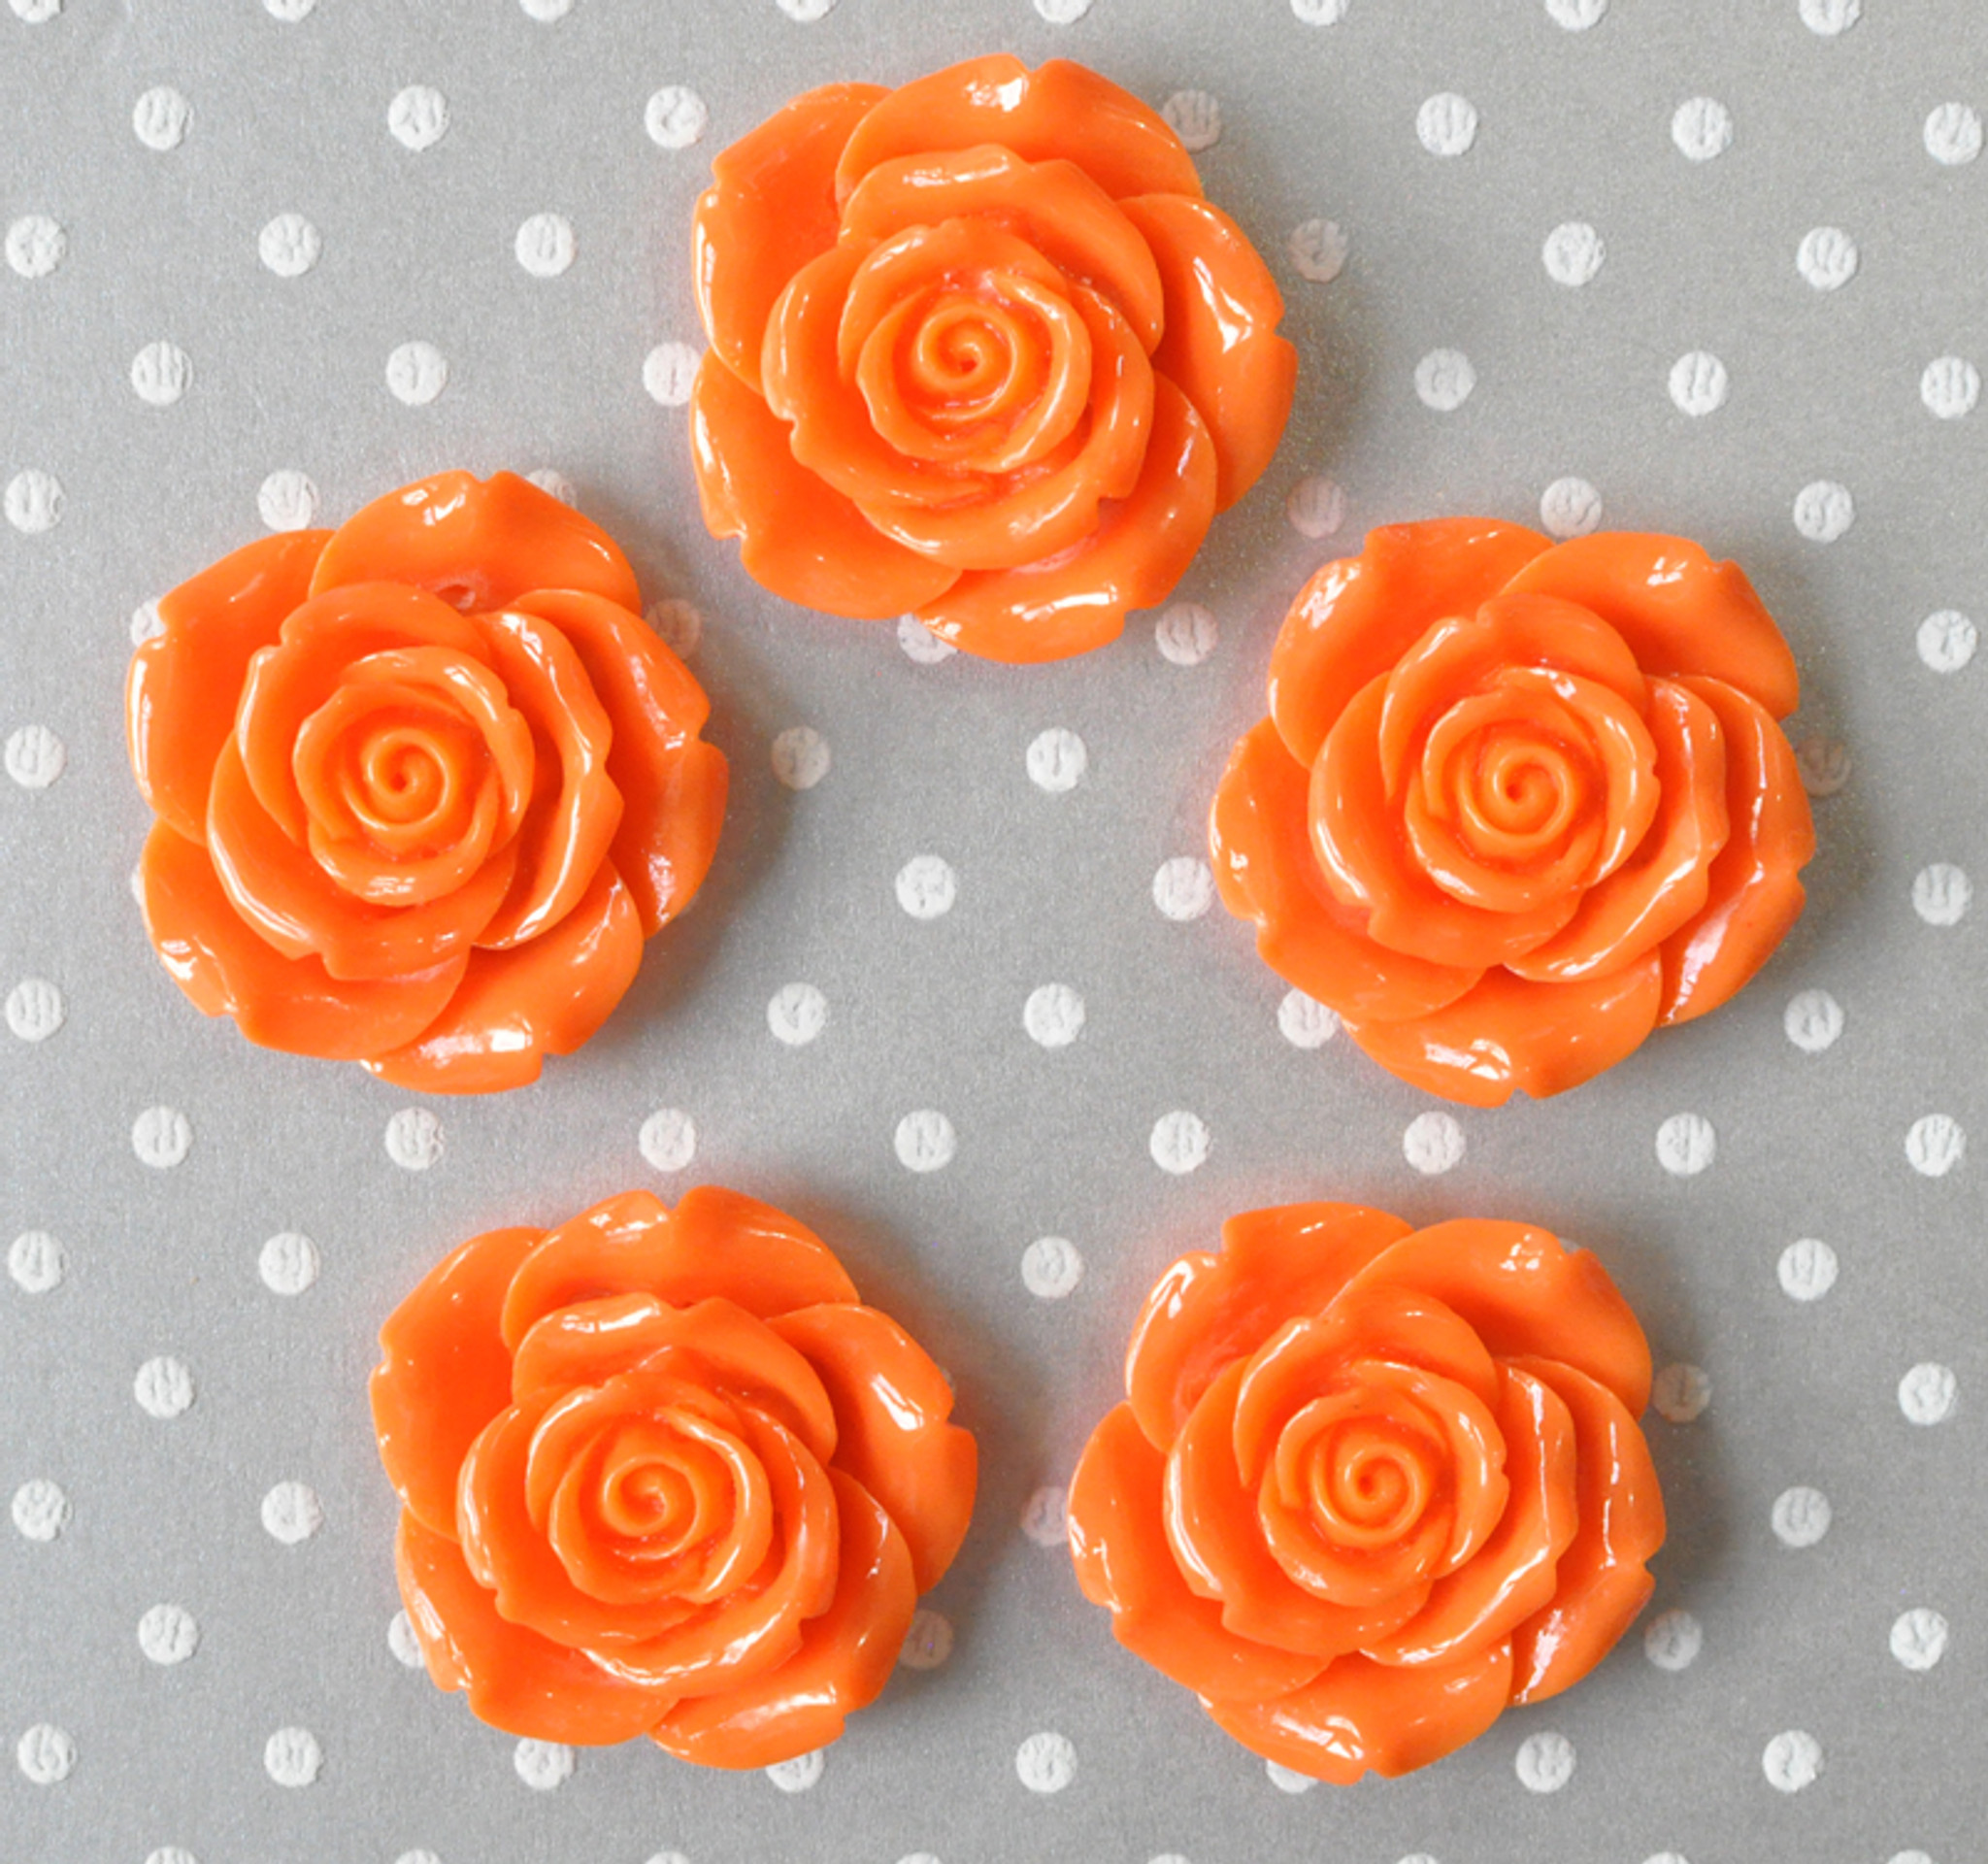 42mm Orange resin flower beads wholesale